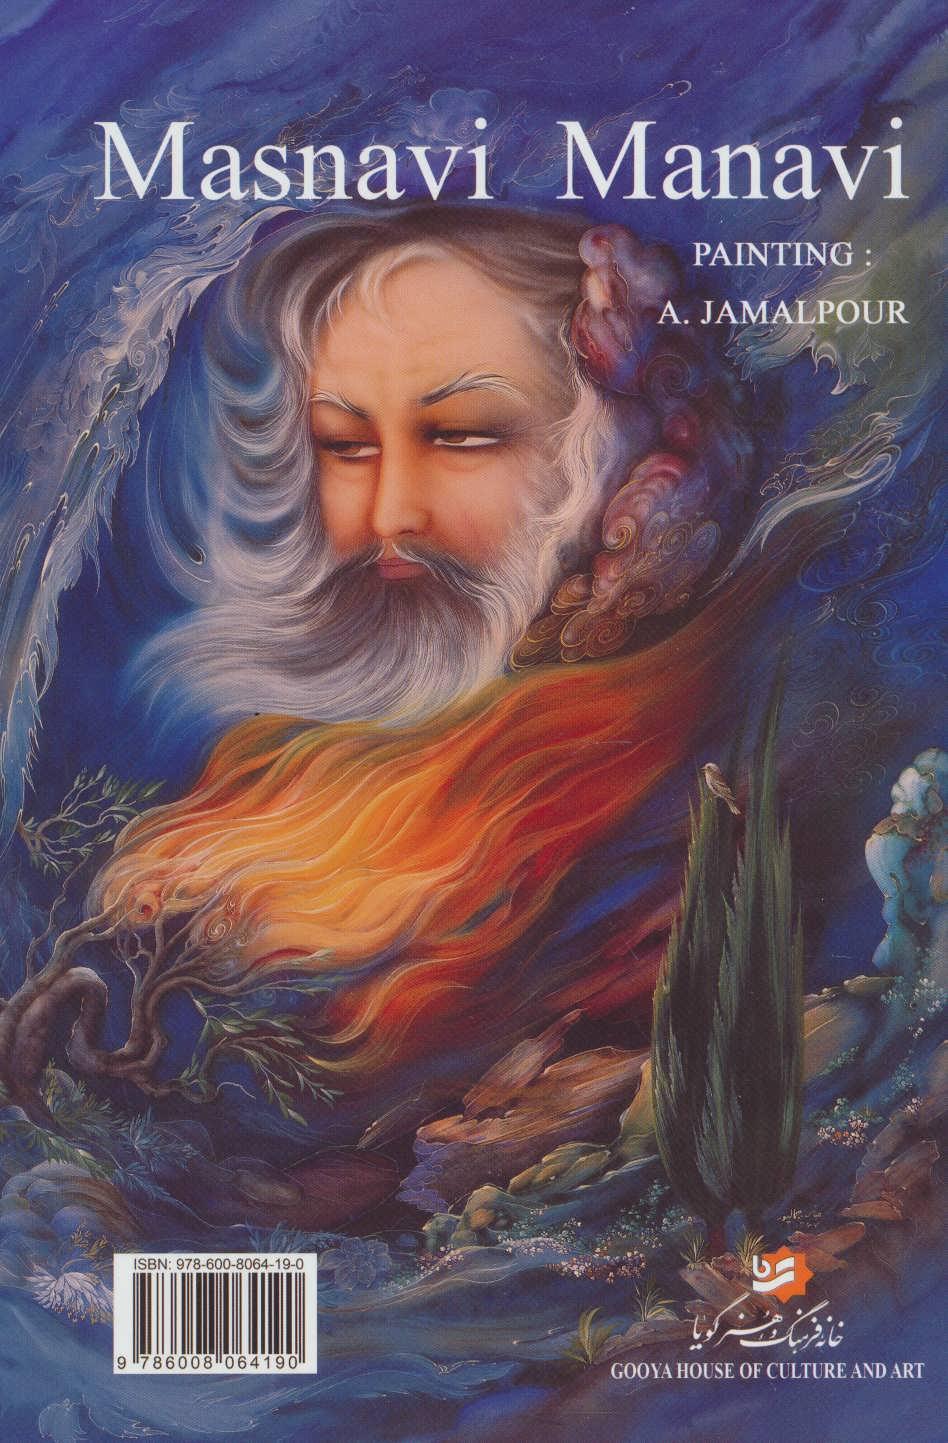 مثنوی معنوی جمال پور با مینیاتور (گلاسه،باقاب)